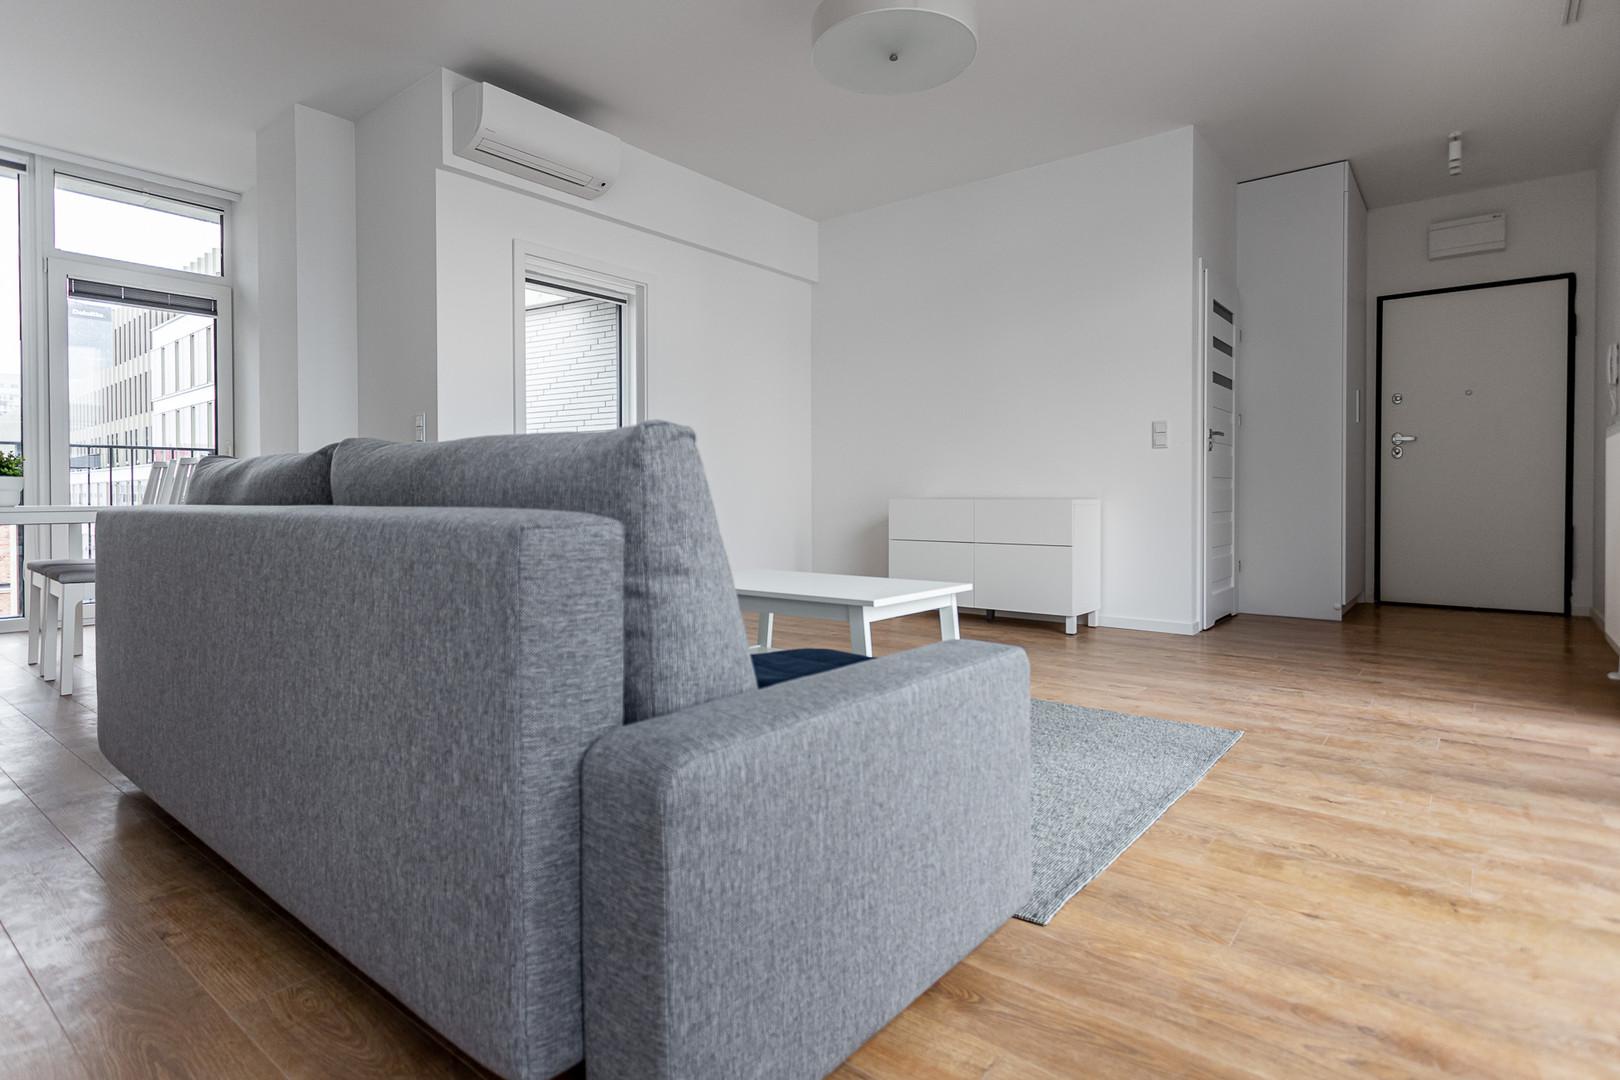 Poznan 2 bedroom apartments for rent-9.j